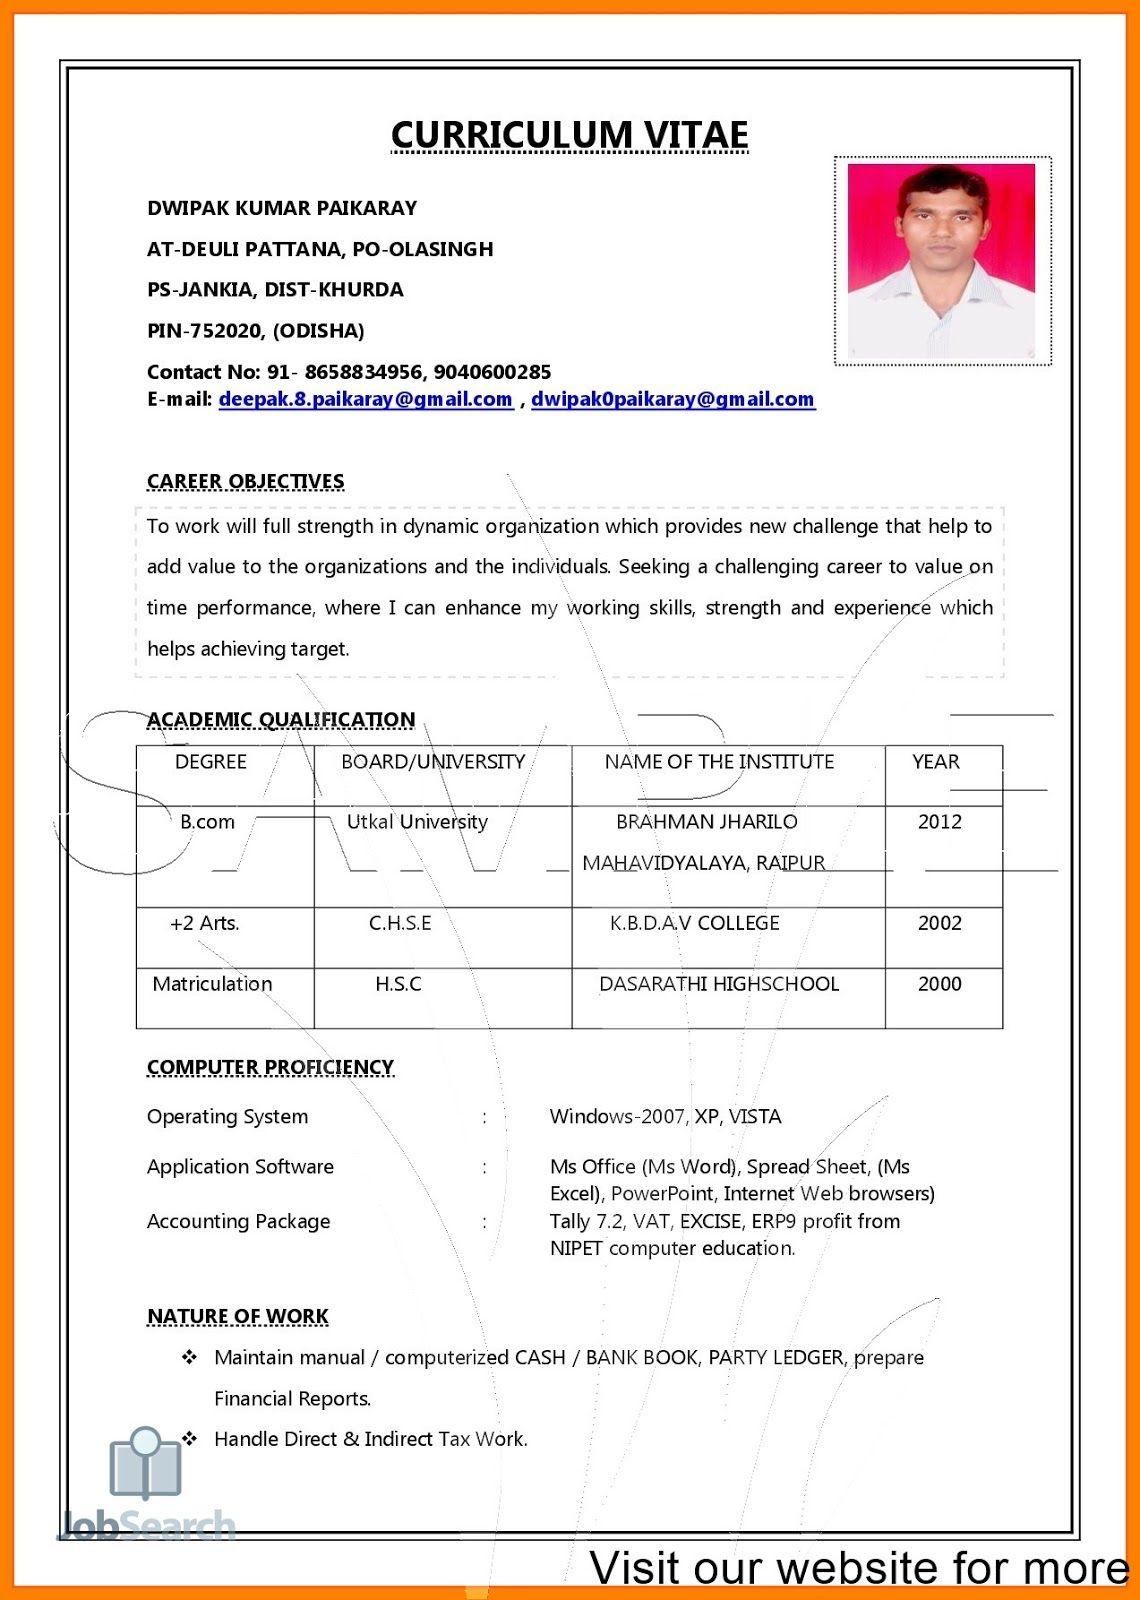 Upload My Resume On Indeed